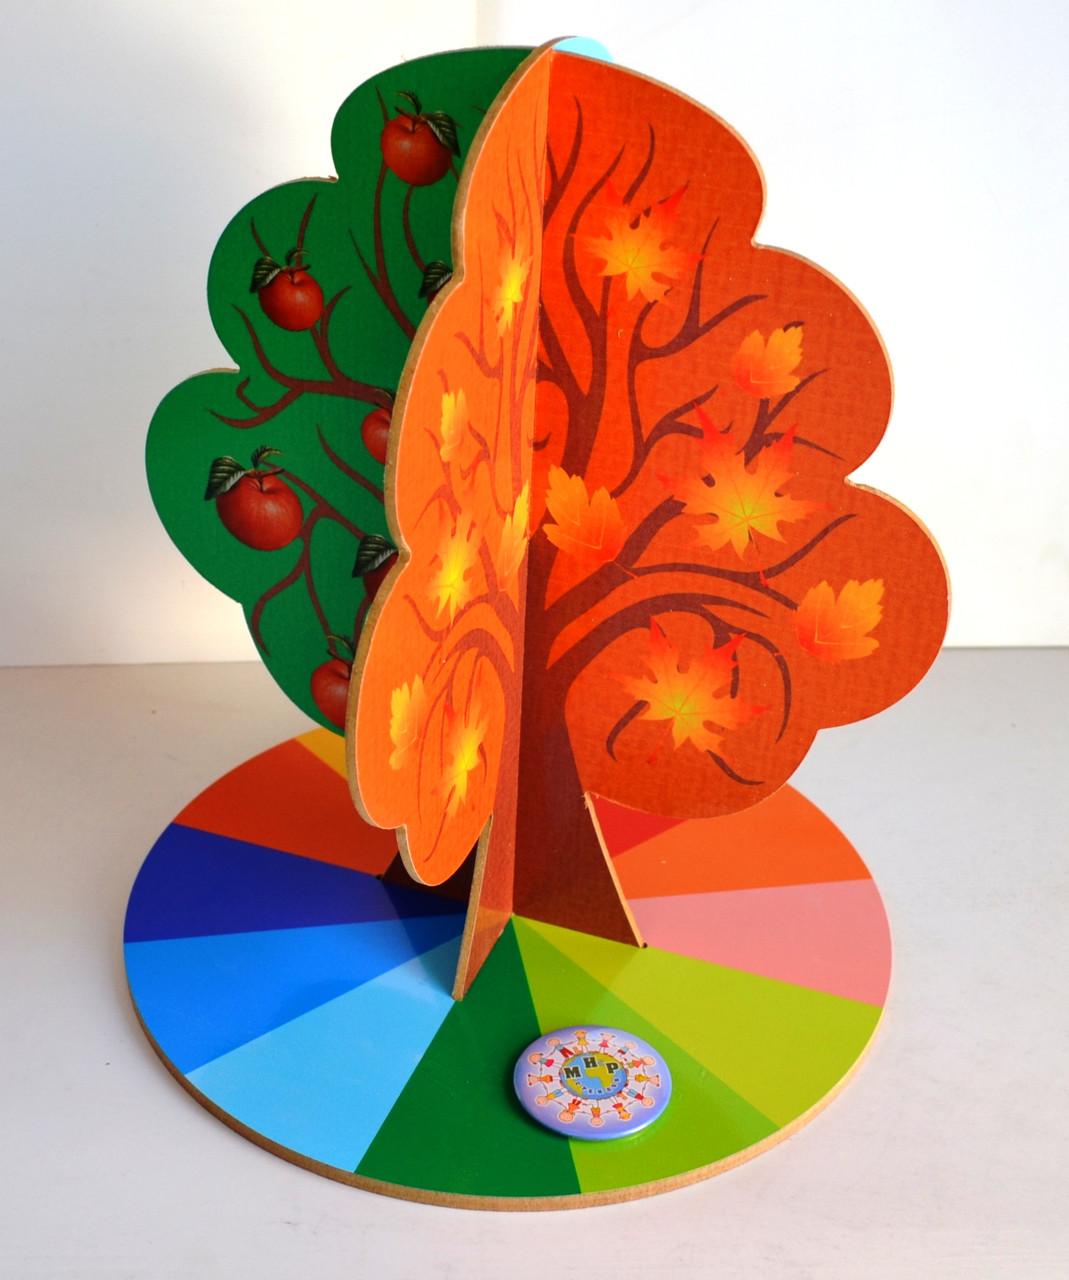 Пособие дерево времена года